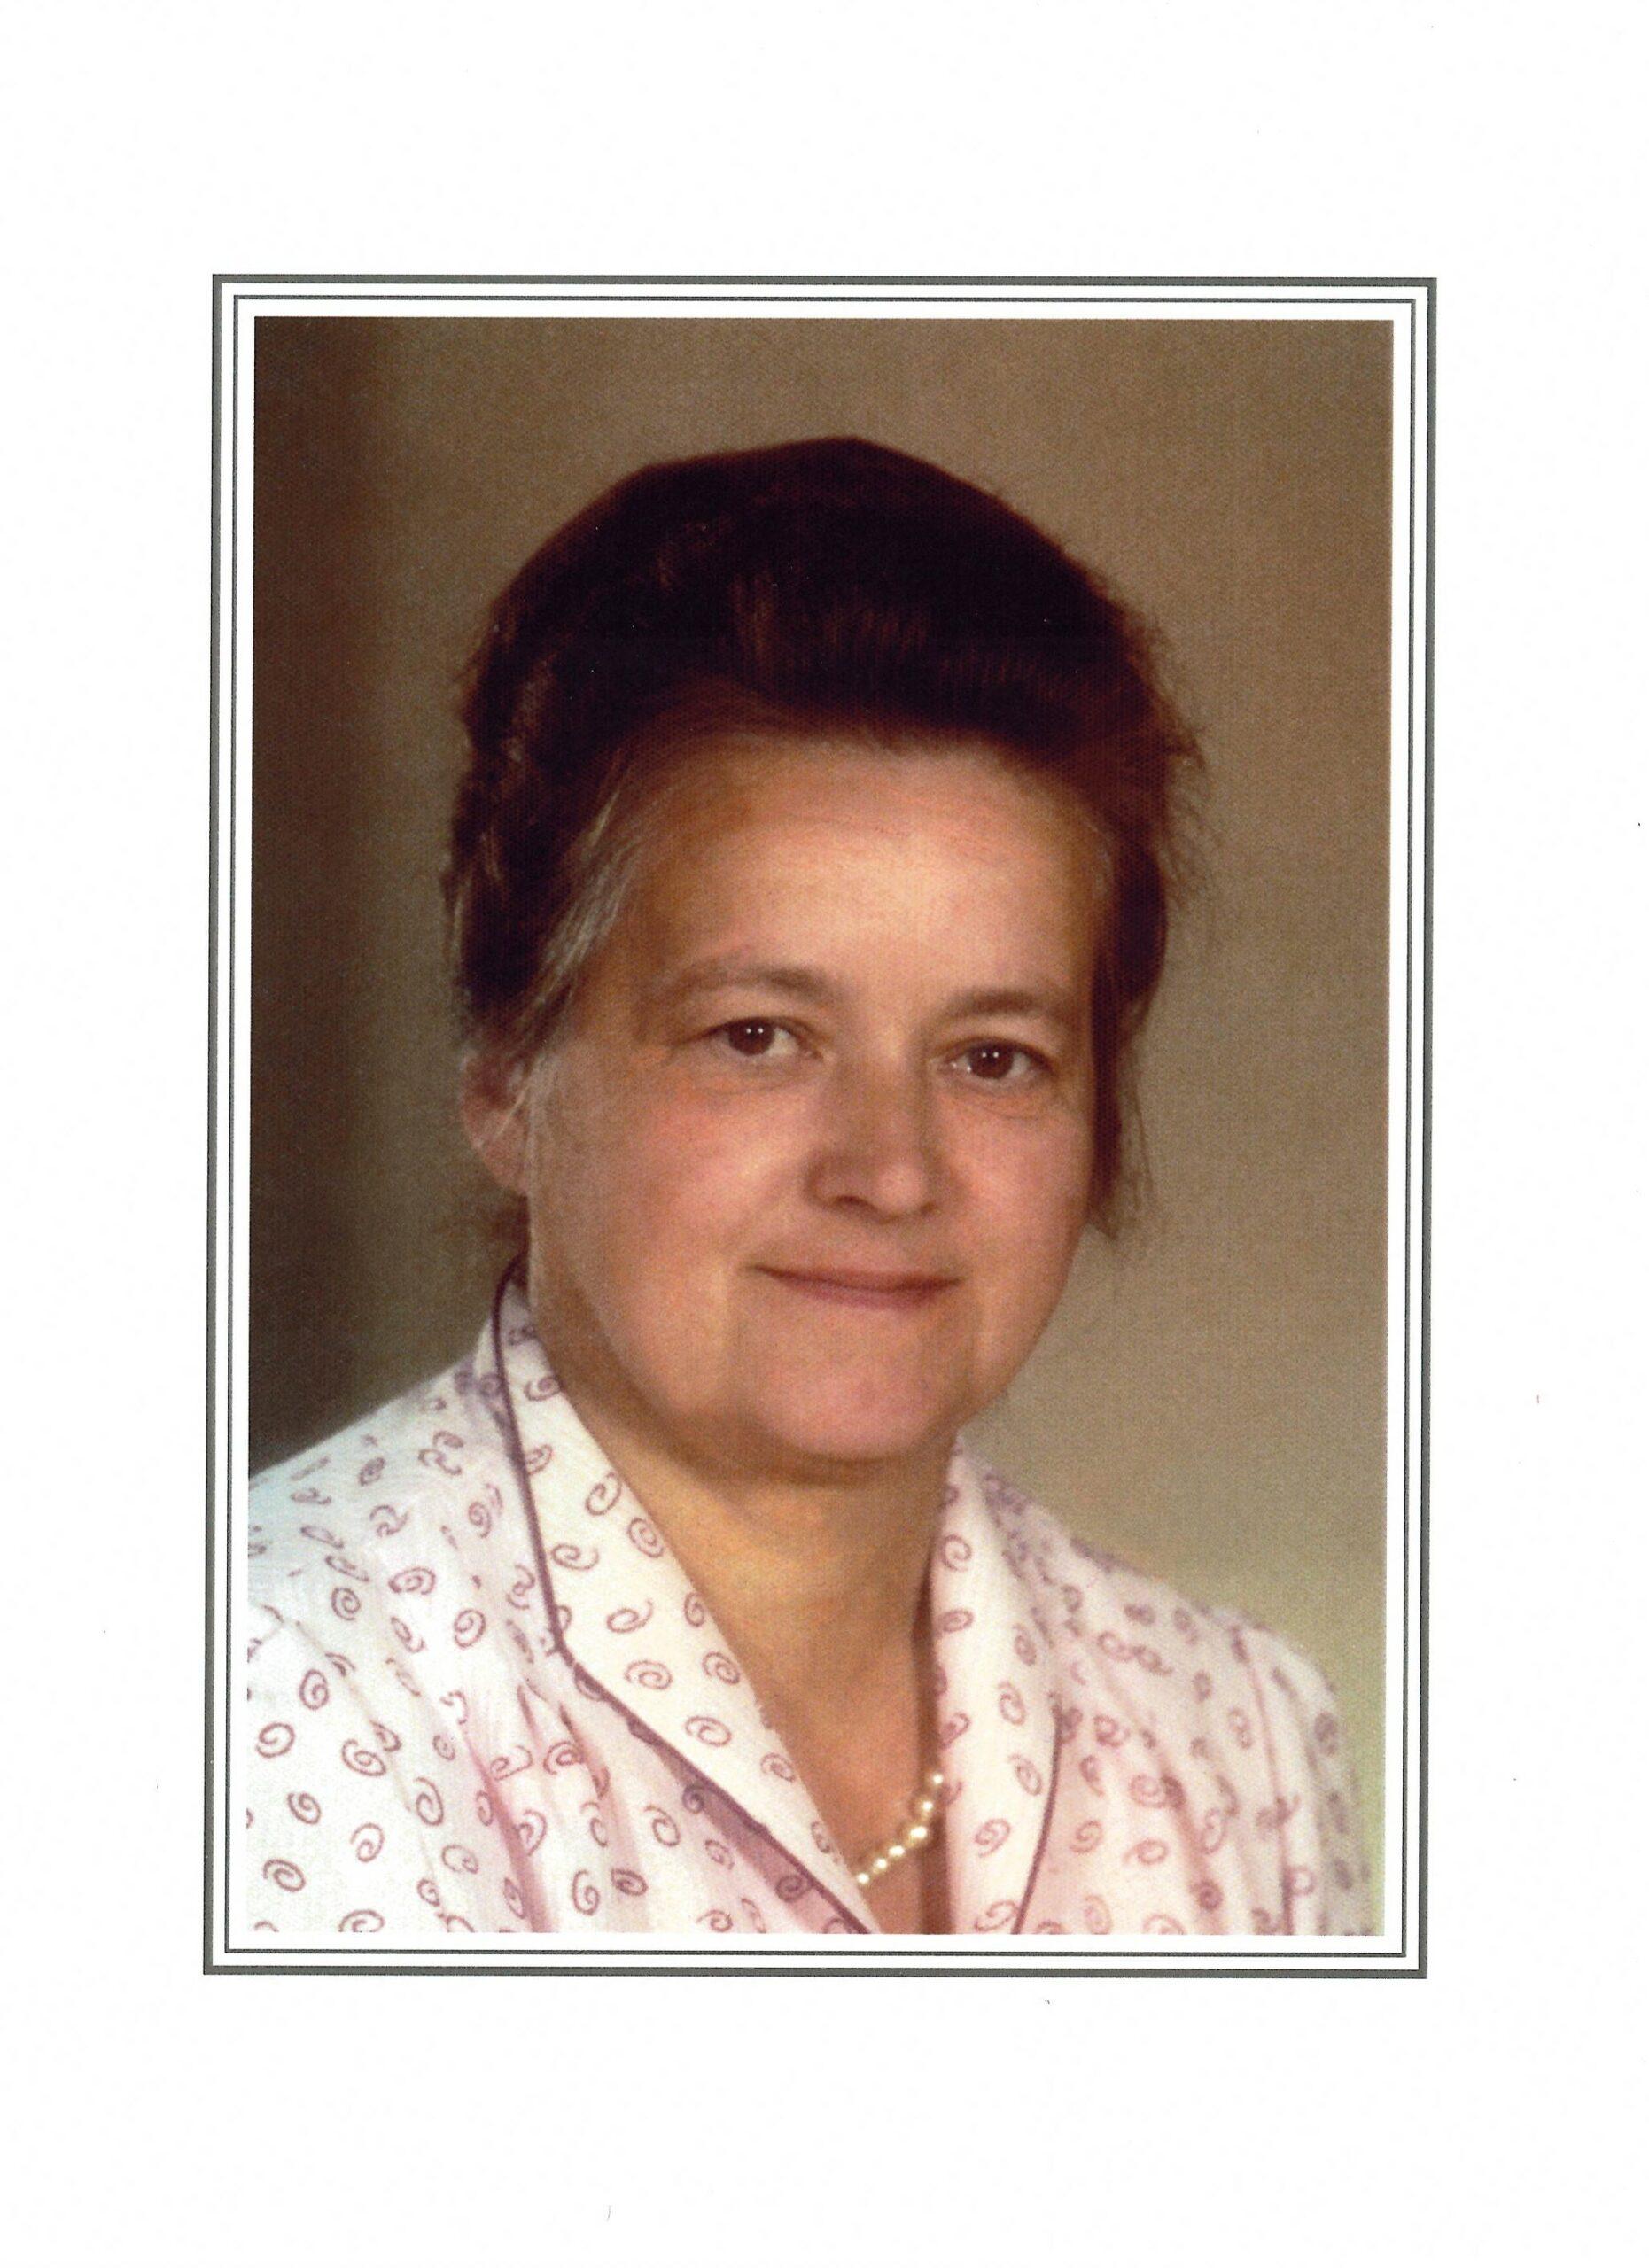 Zäzilia Hainz